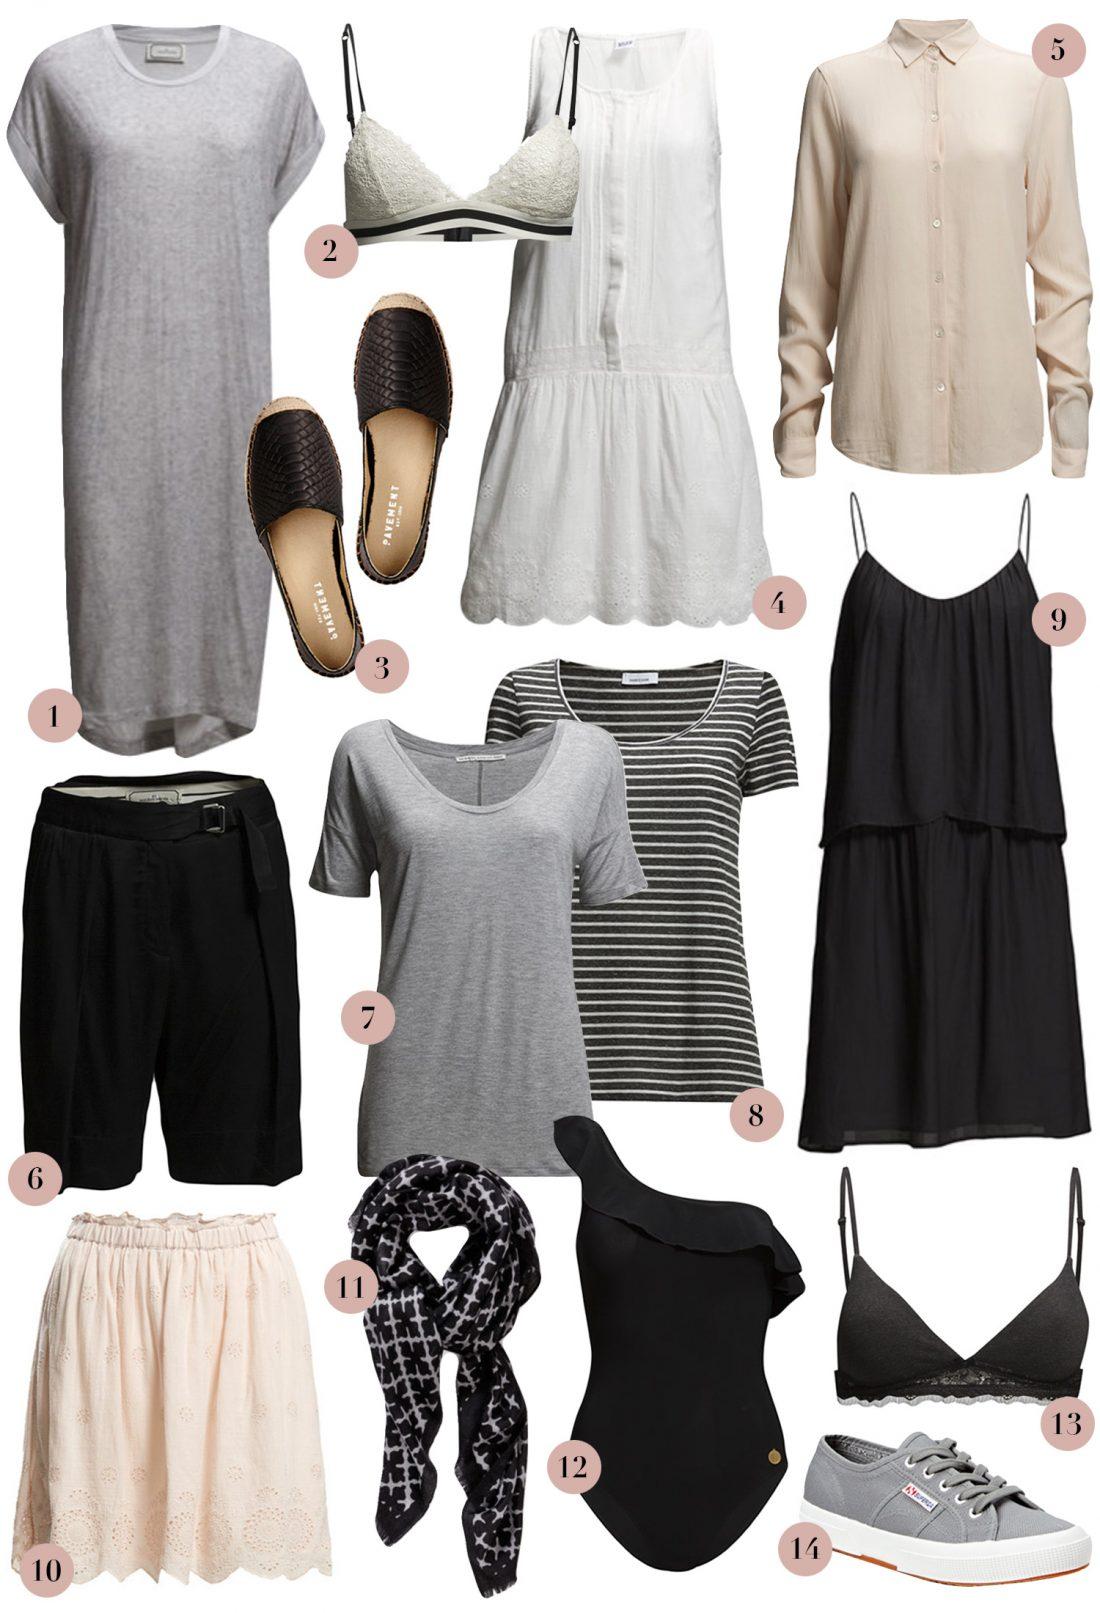 boozt-tøj-online-shopping-sommertøj-modeblog-@2x1.jpg